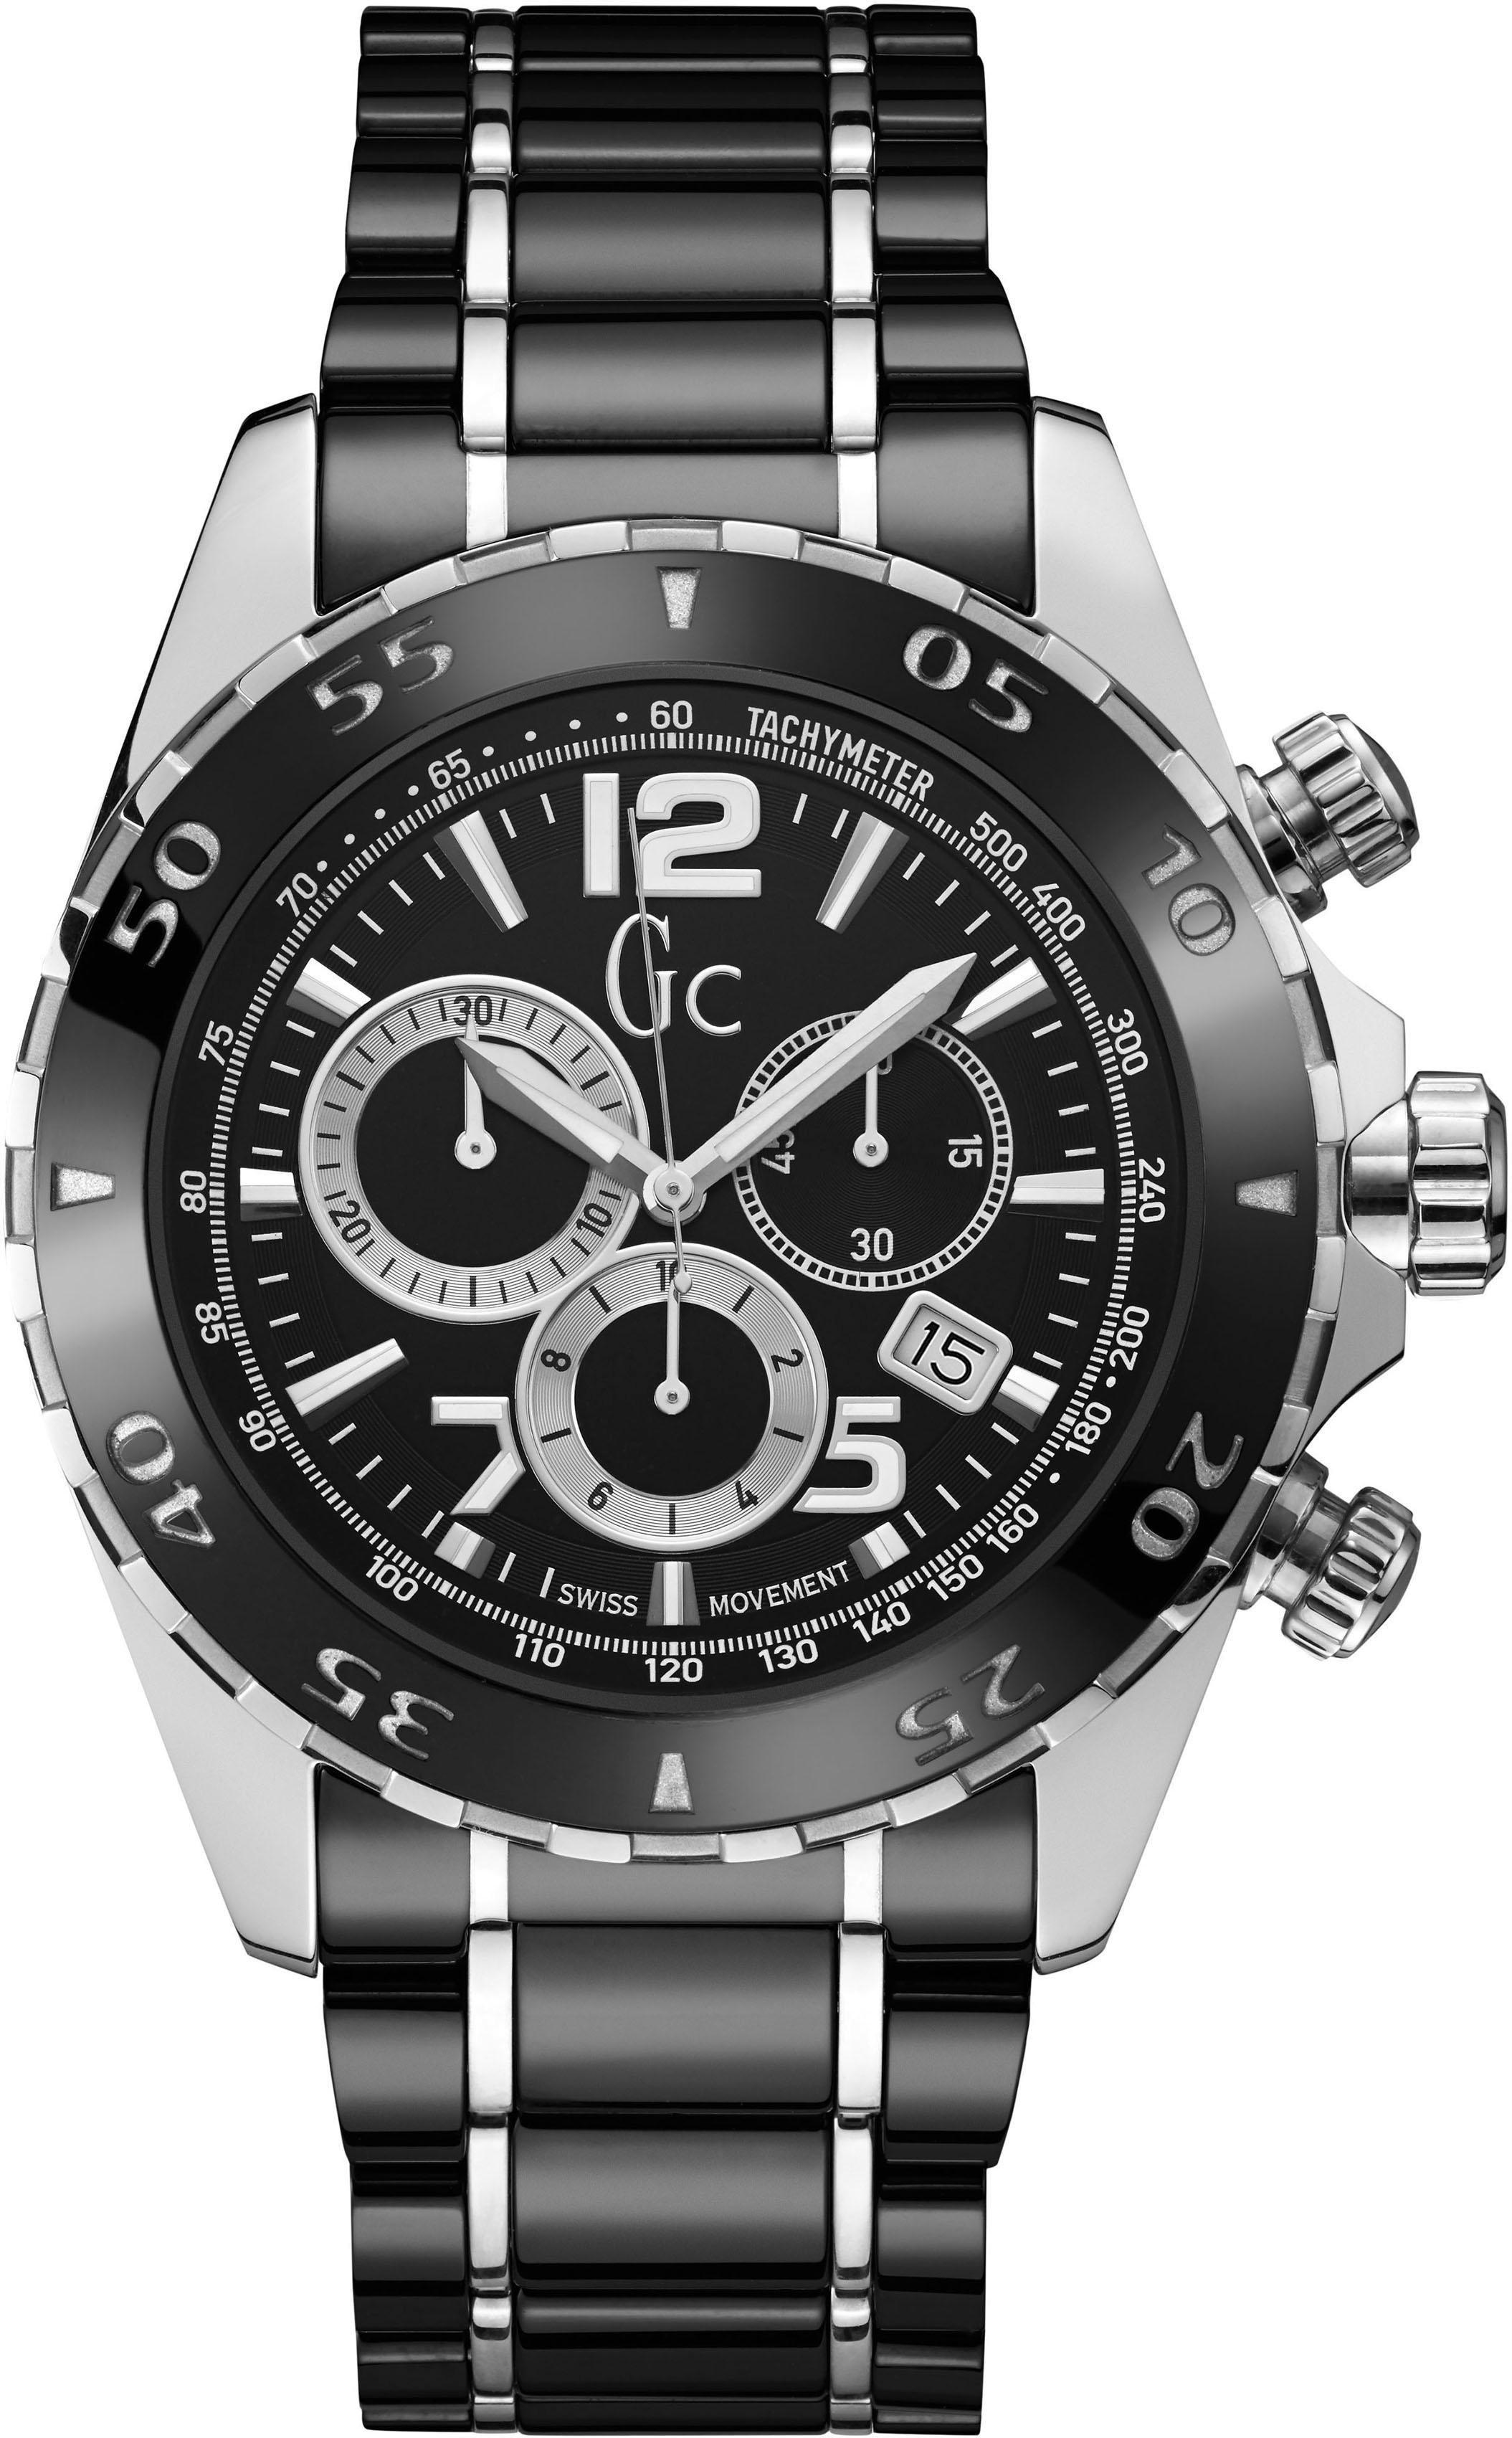 Gc chronograaf »Gc SportRacer, Y02015G2« - verschillende betaalmethodes